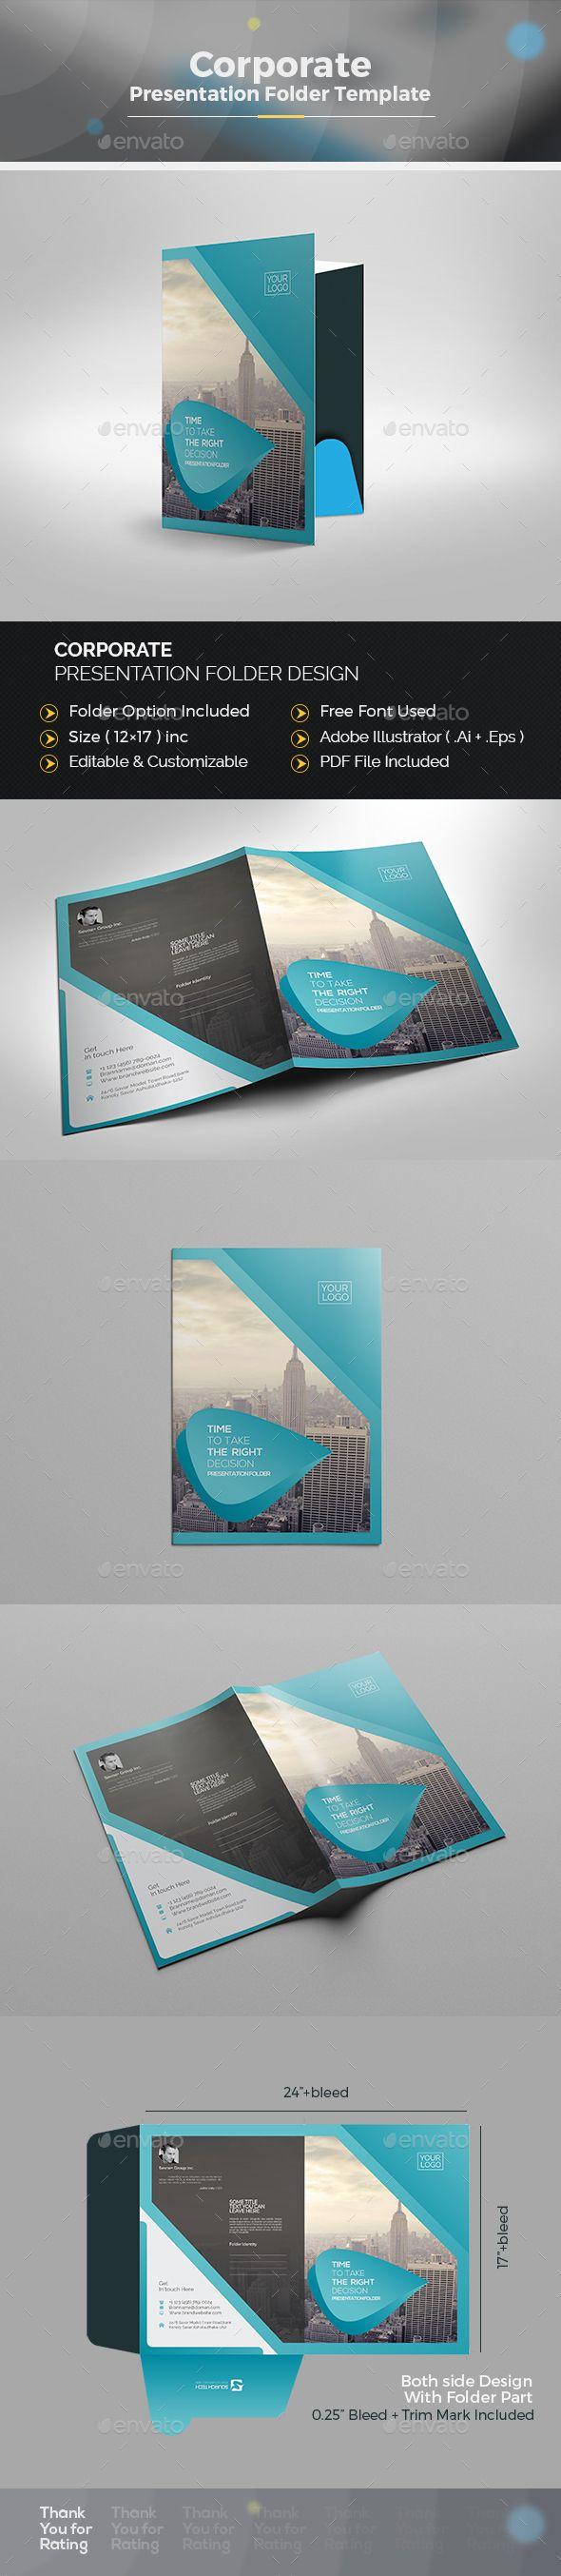 pocket folder template illustrator - 1000 ideas about presentation folder on pinterest